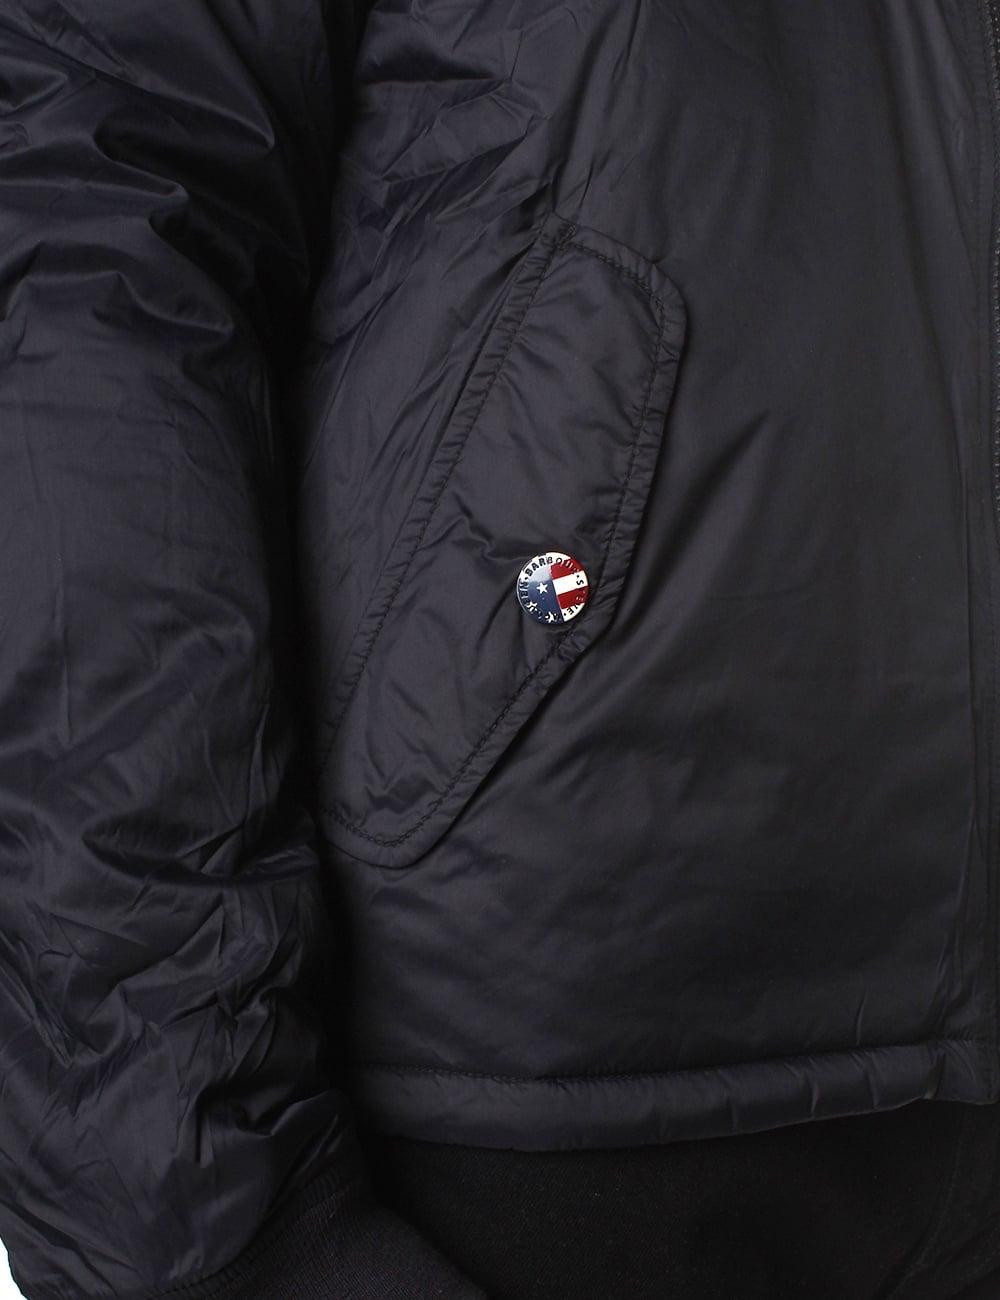 at mens quilt international man poler barbour jacket ariel the quilted black idle